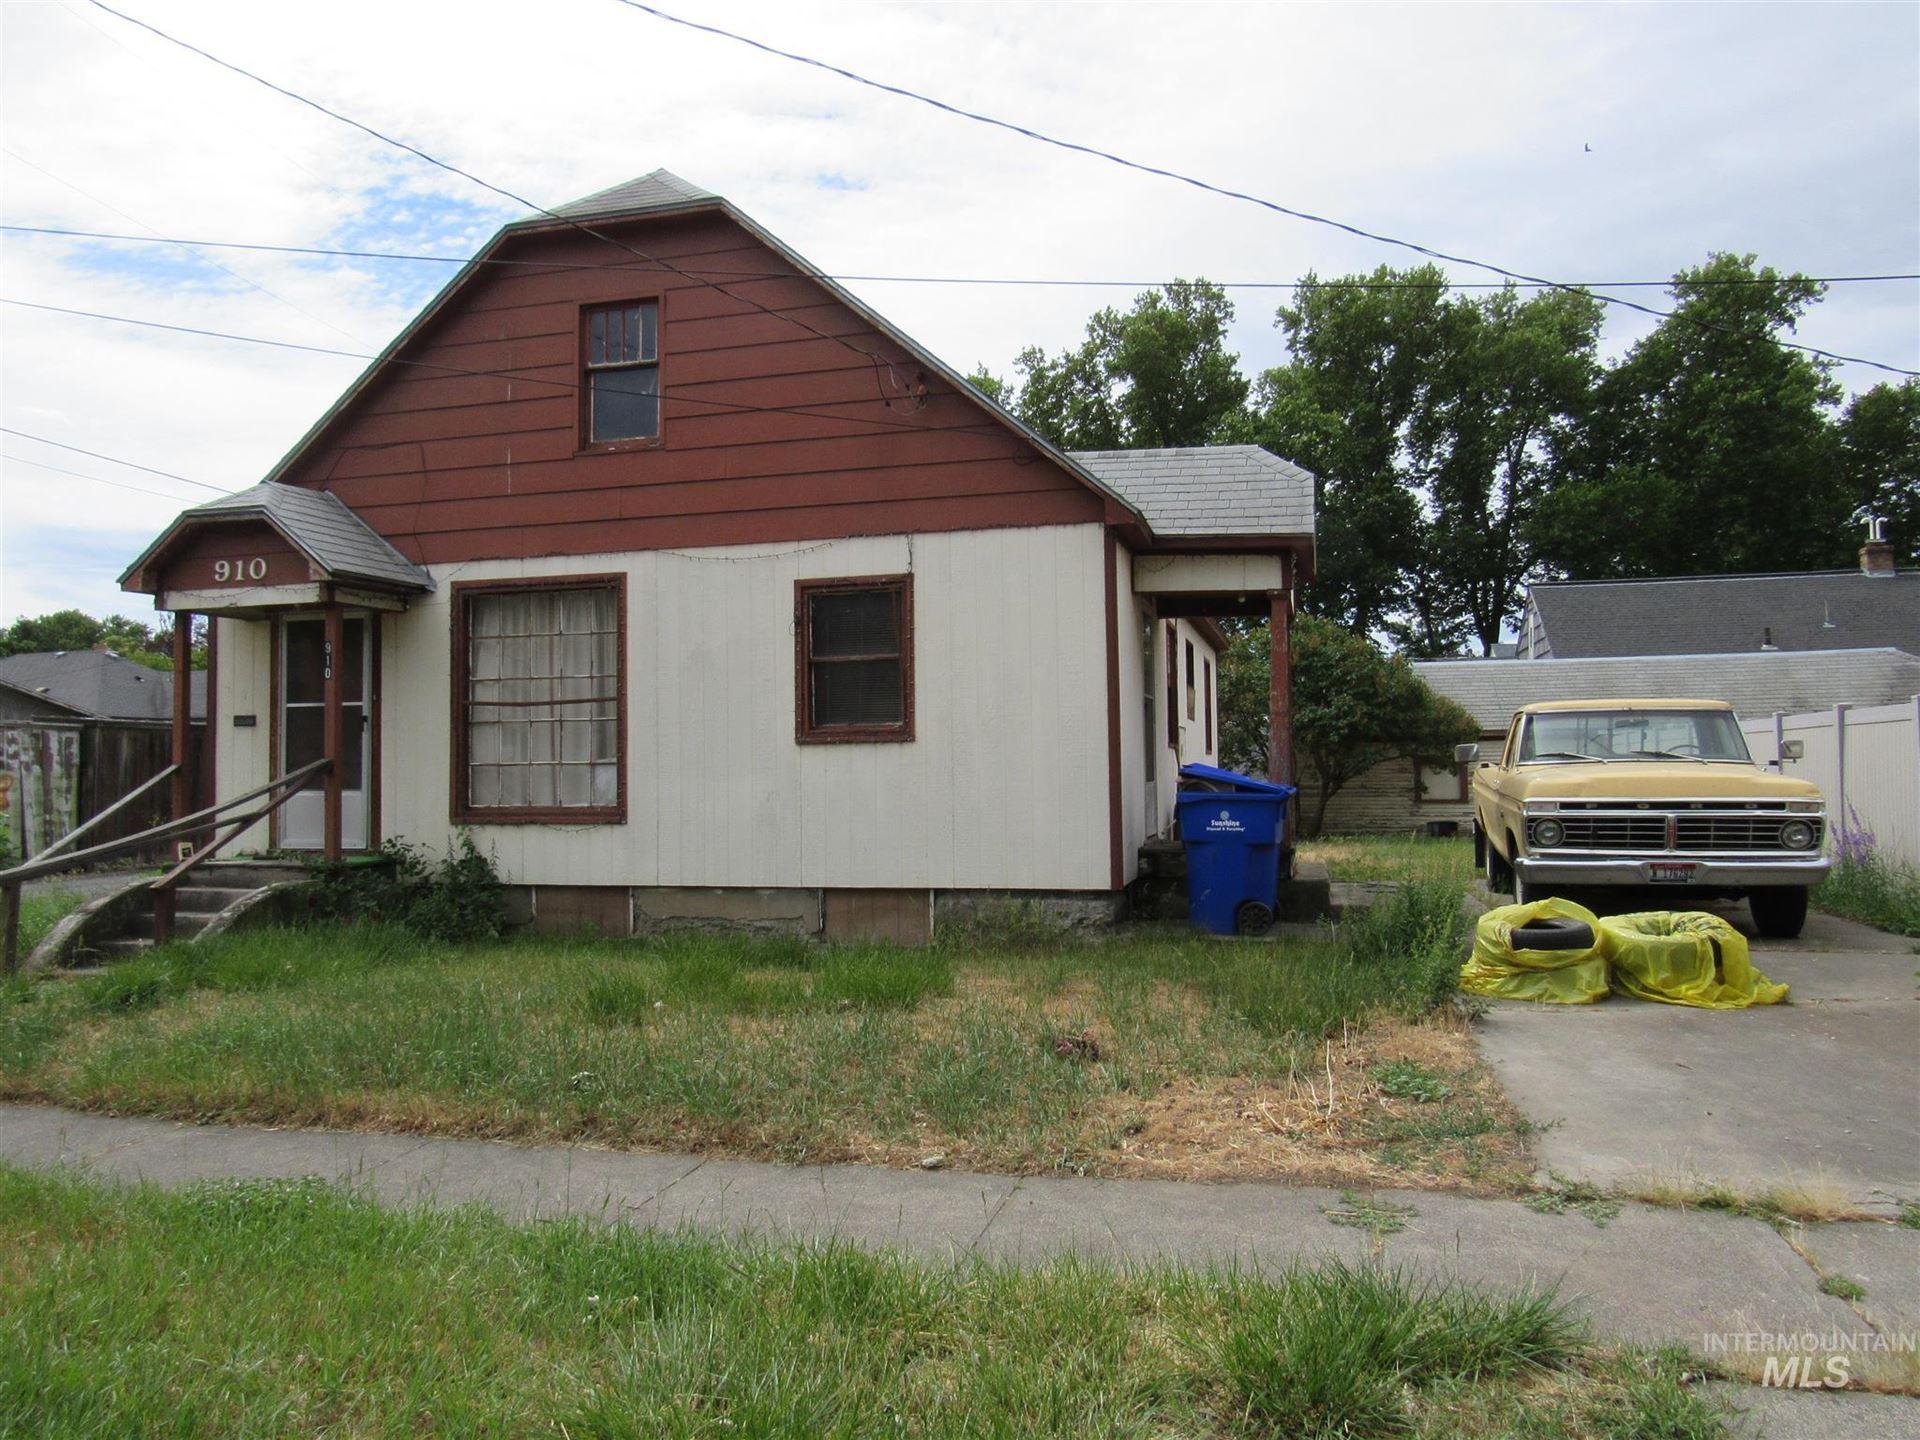 Photo of 910 12th Ave., Lewiston, ID 83501 (MLS # 98806762)